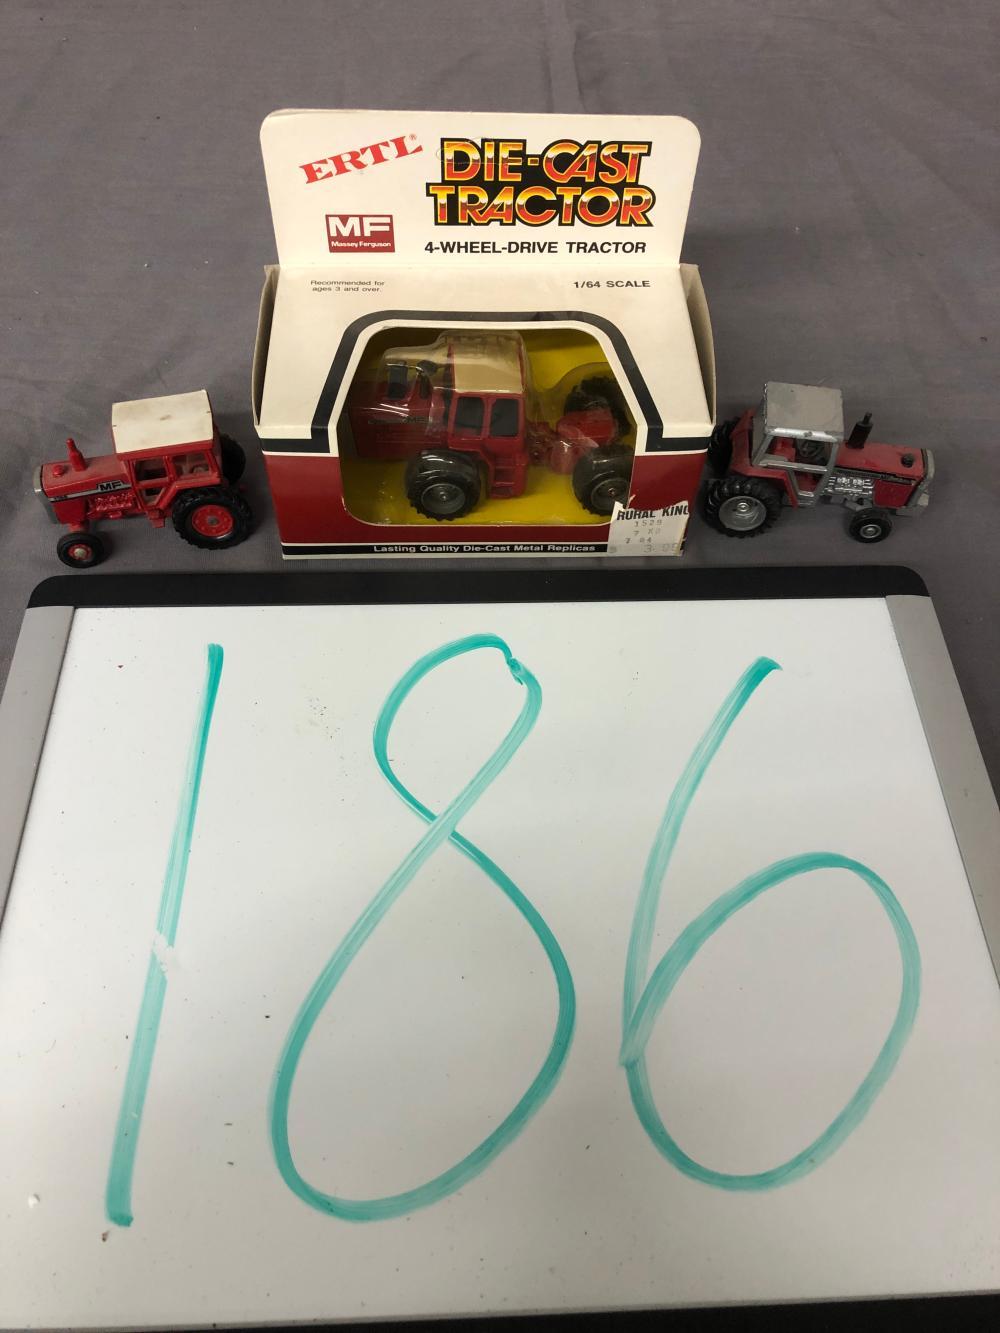 (3) 1/64th Scale Massey Ferguson Tractors